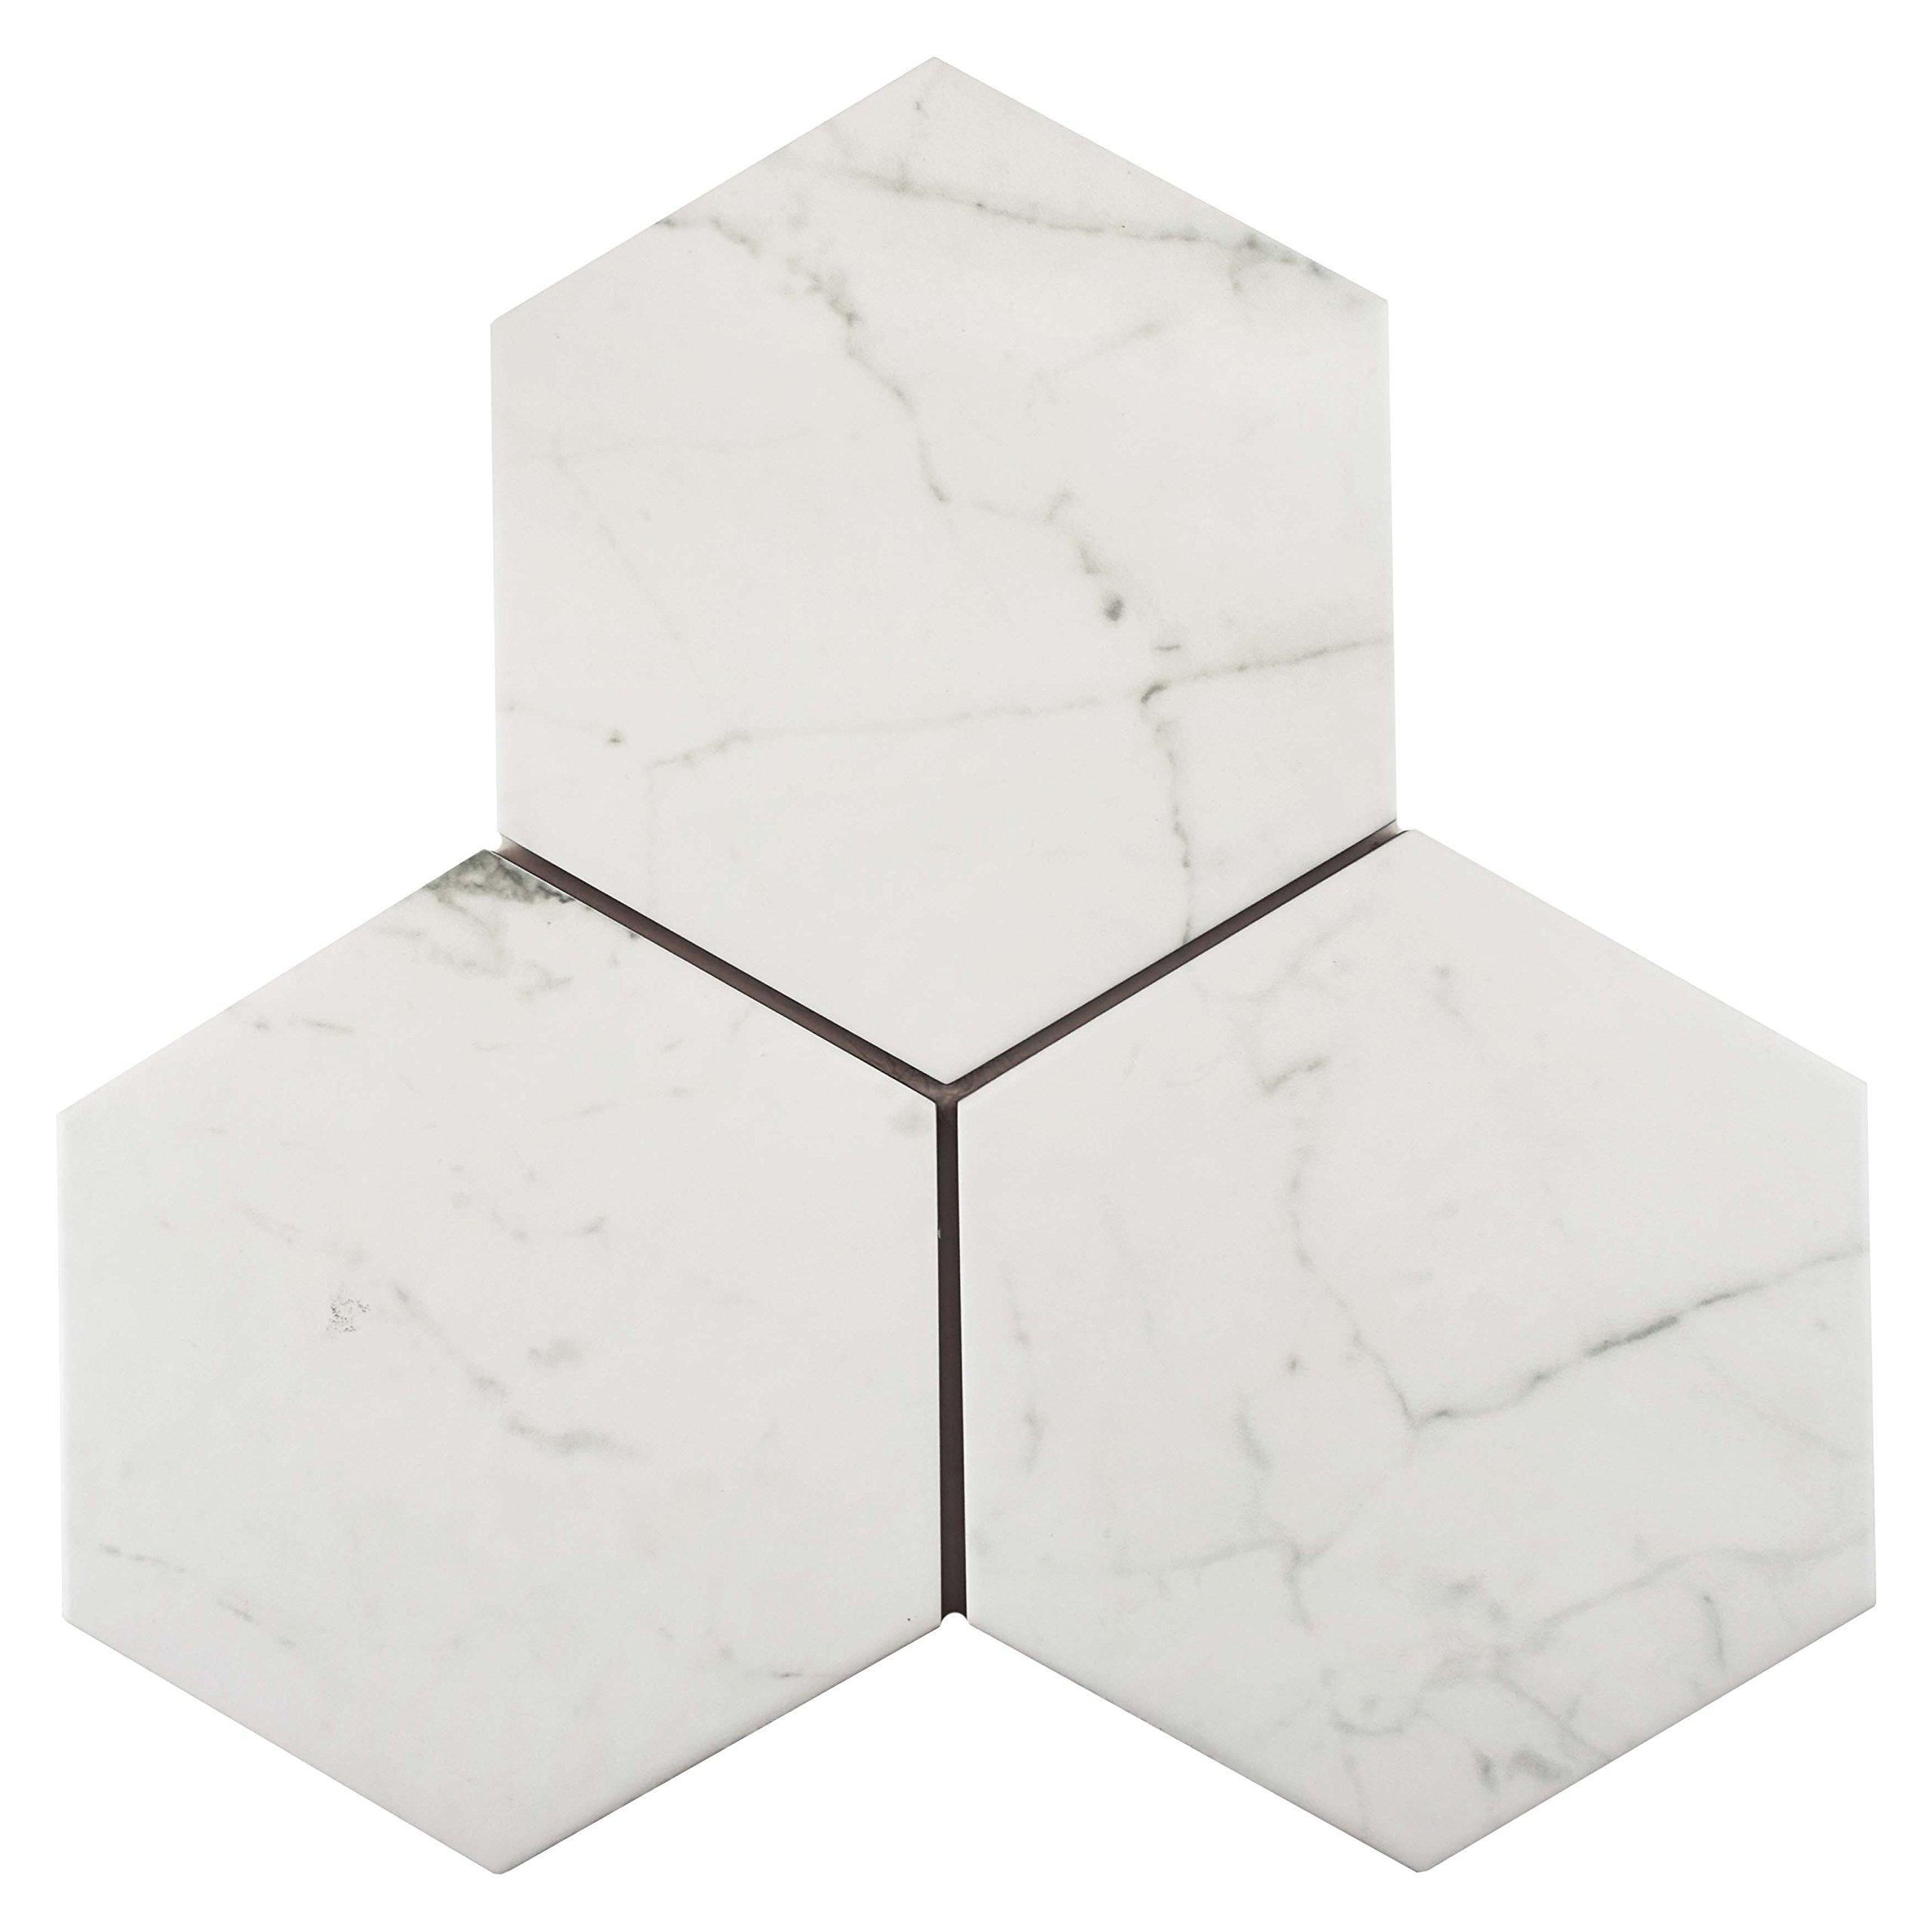 SomerTile FEQCRX Murmur Carrara Hexagon Porcelain Floor & Wall Tile, 7'' x 8'' (Pack of 25) by SOMERTILE (Image #11)